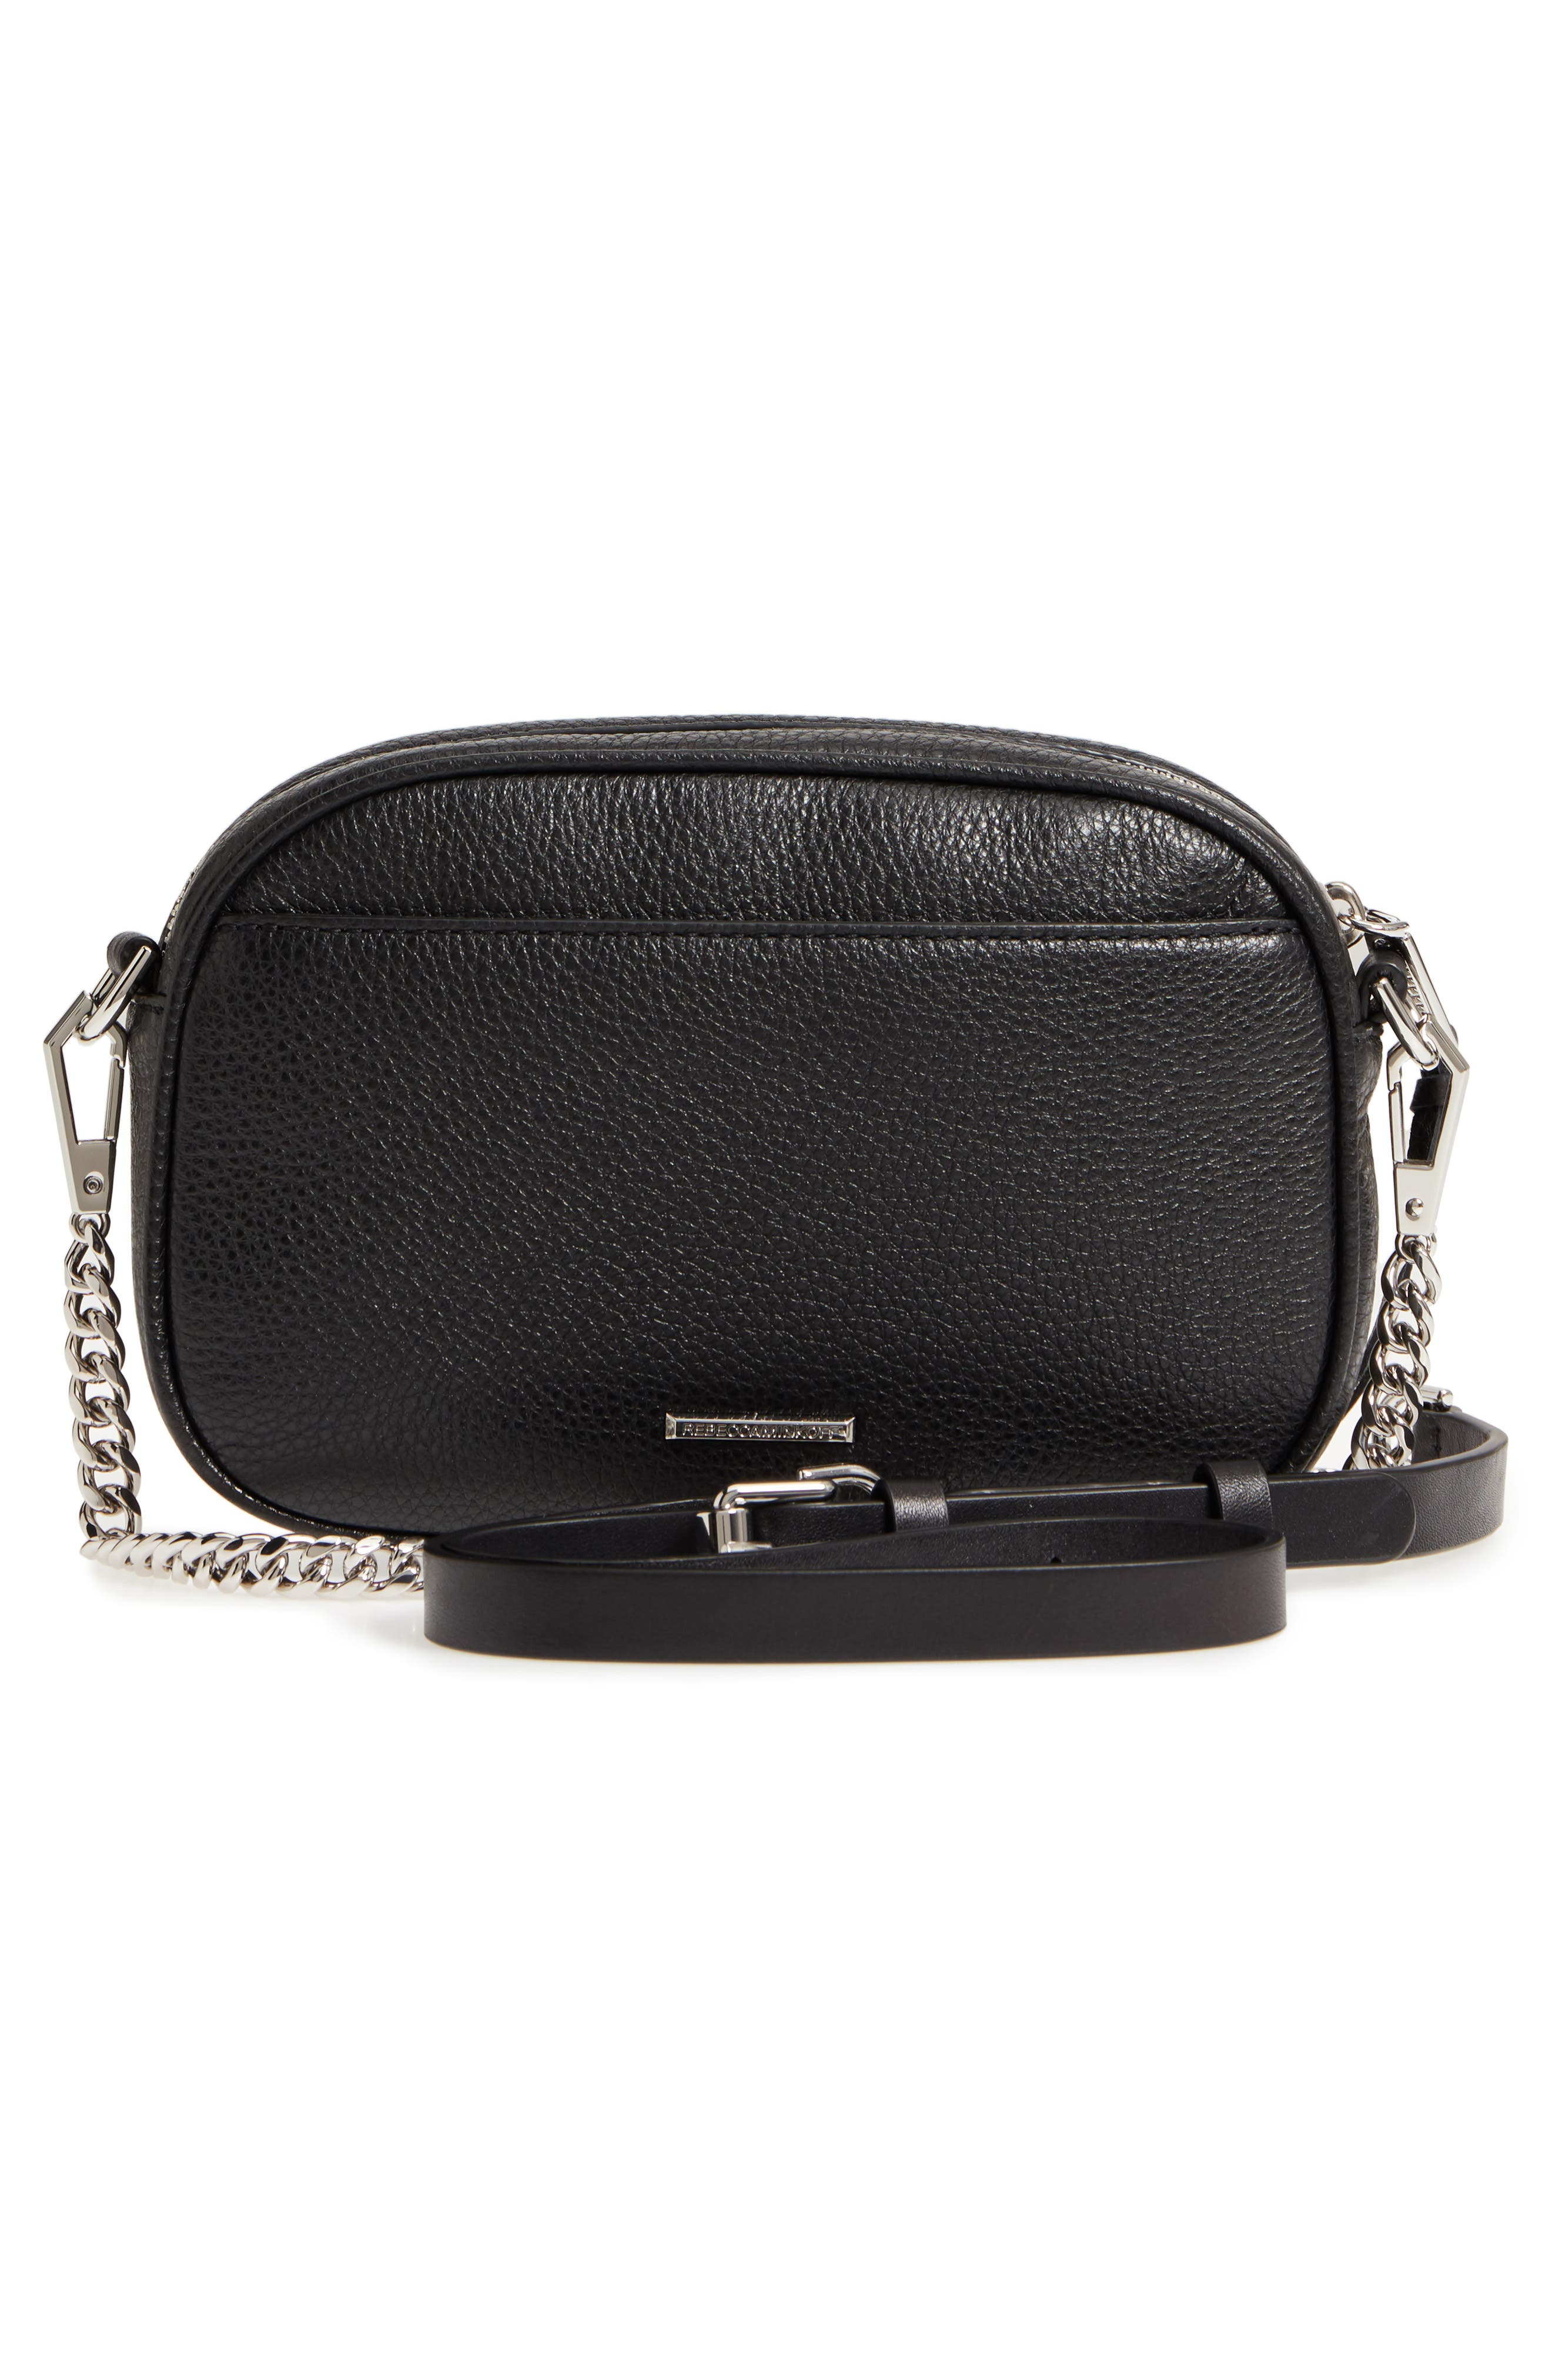 REBECCA MINKOFF,                             Blythe Leather Crossbody Bag,                             Alternate thumbnail 3, color,                             BLACK